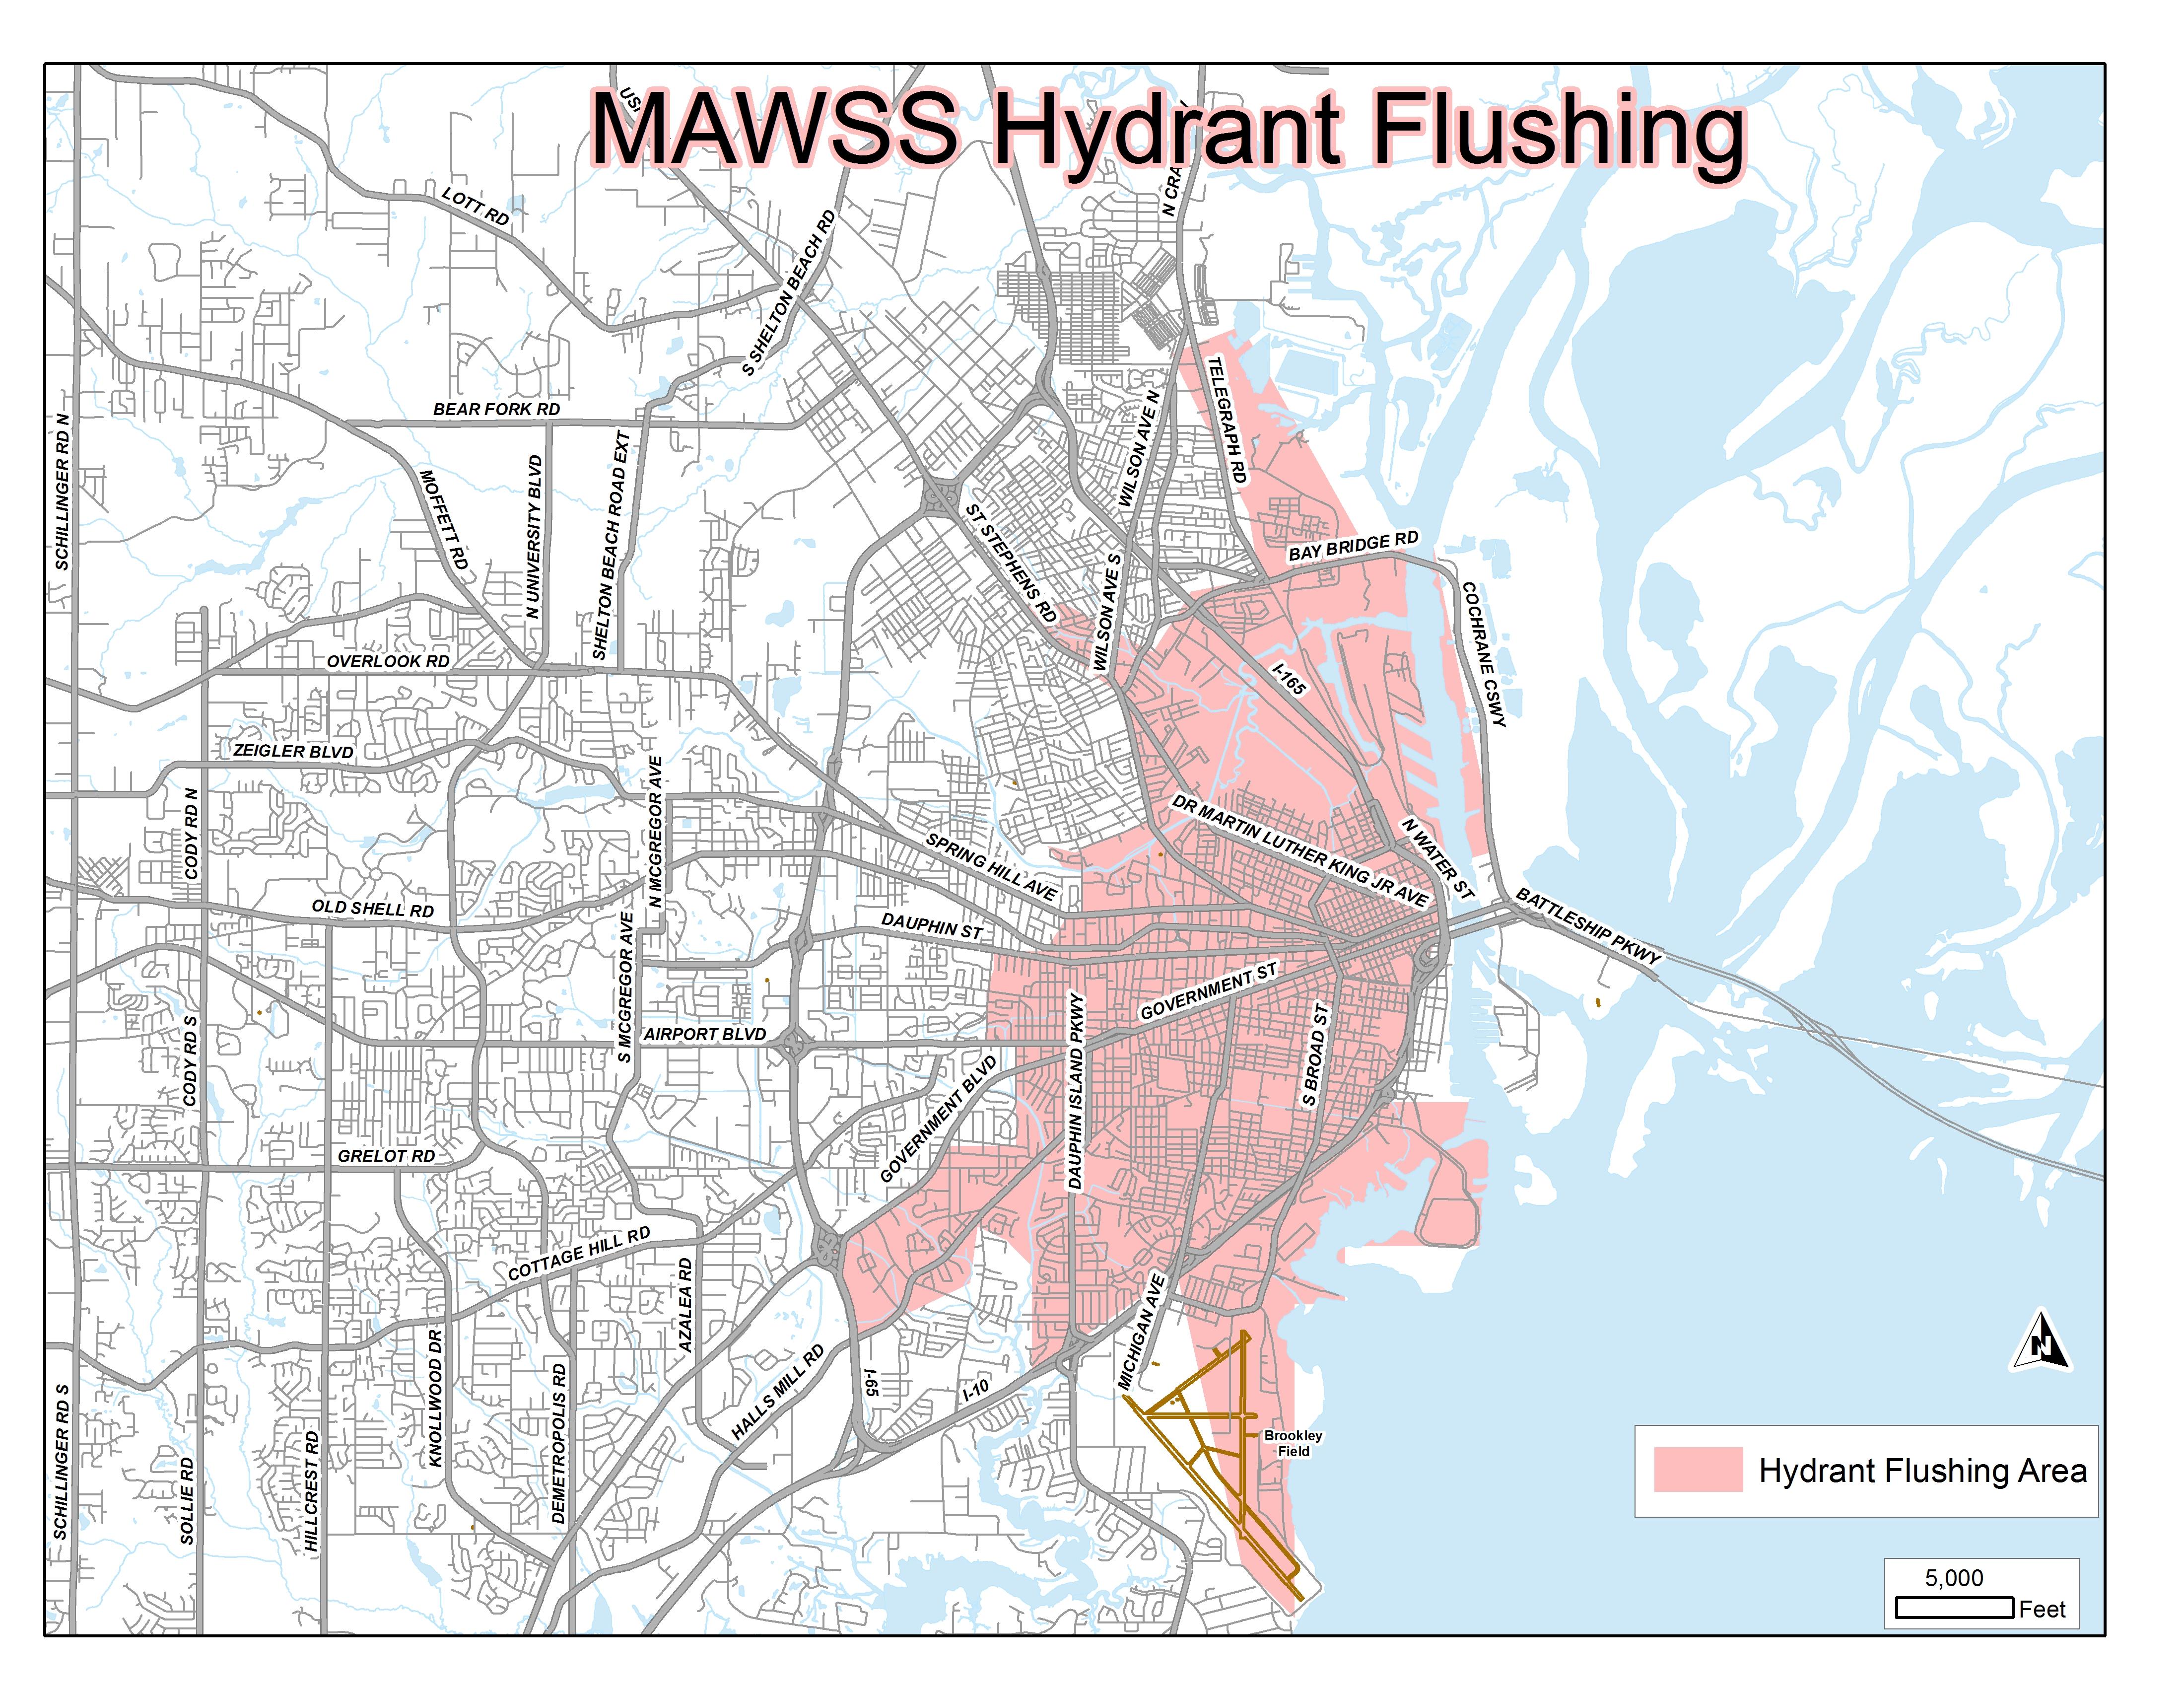 hydrant-flushing-october-november-2021-map.jpg